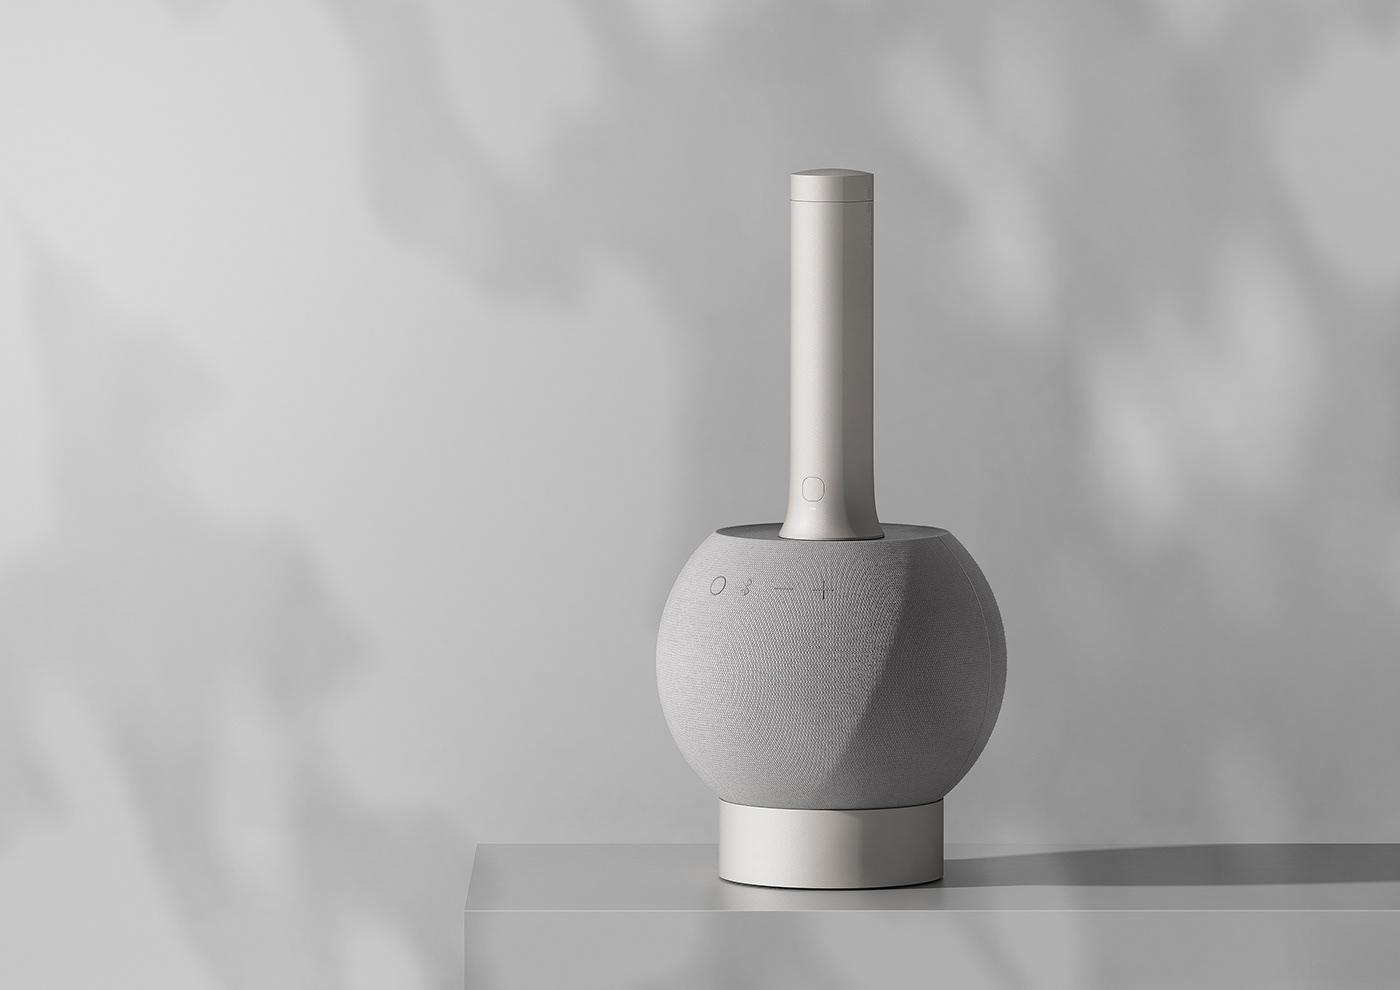 fabric light lighting mic microphone objet product sound speaker design